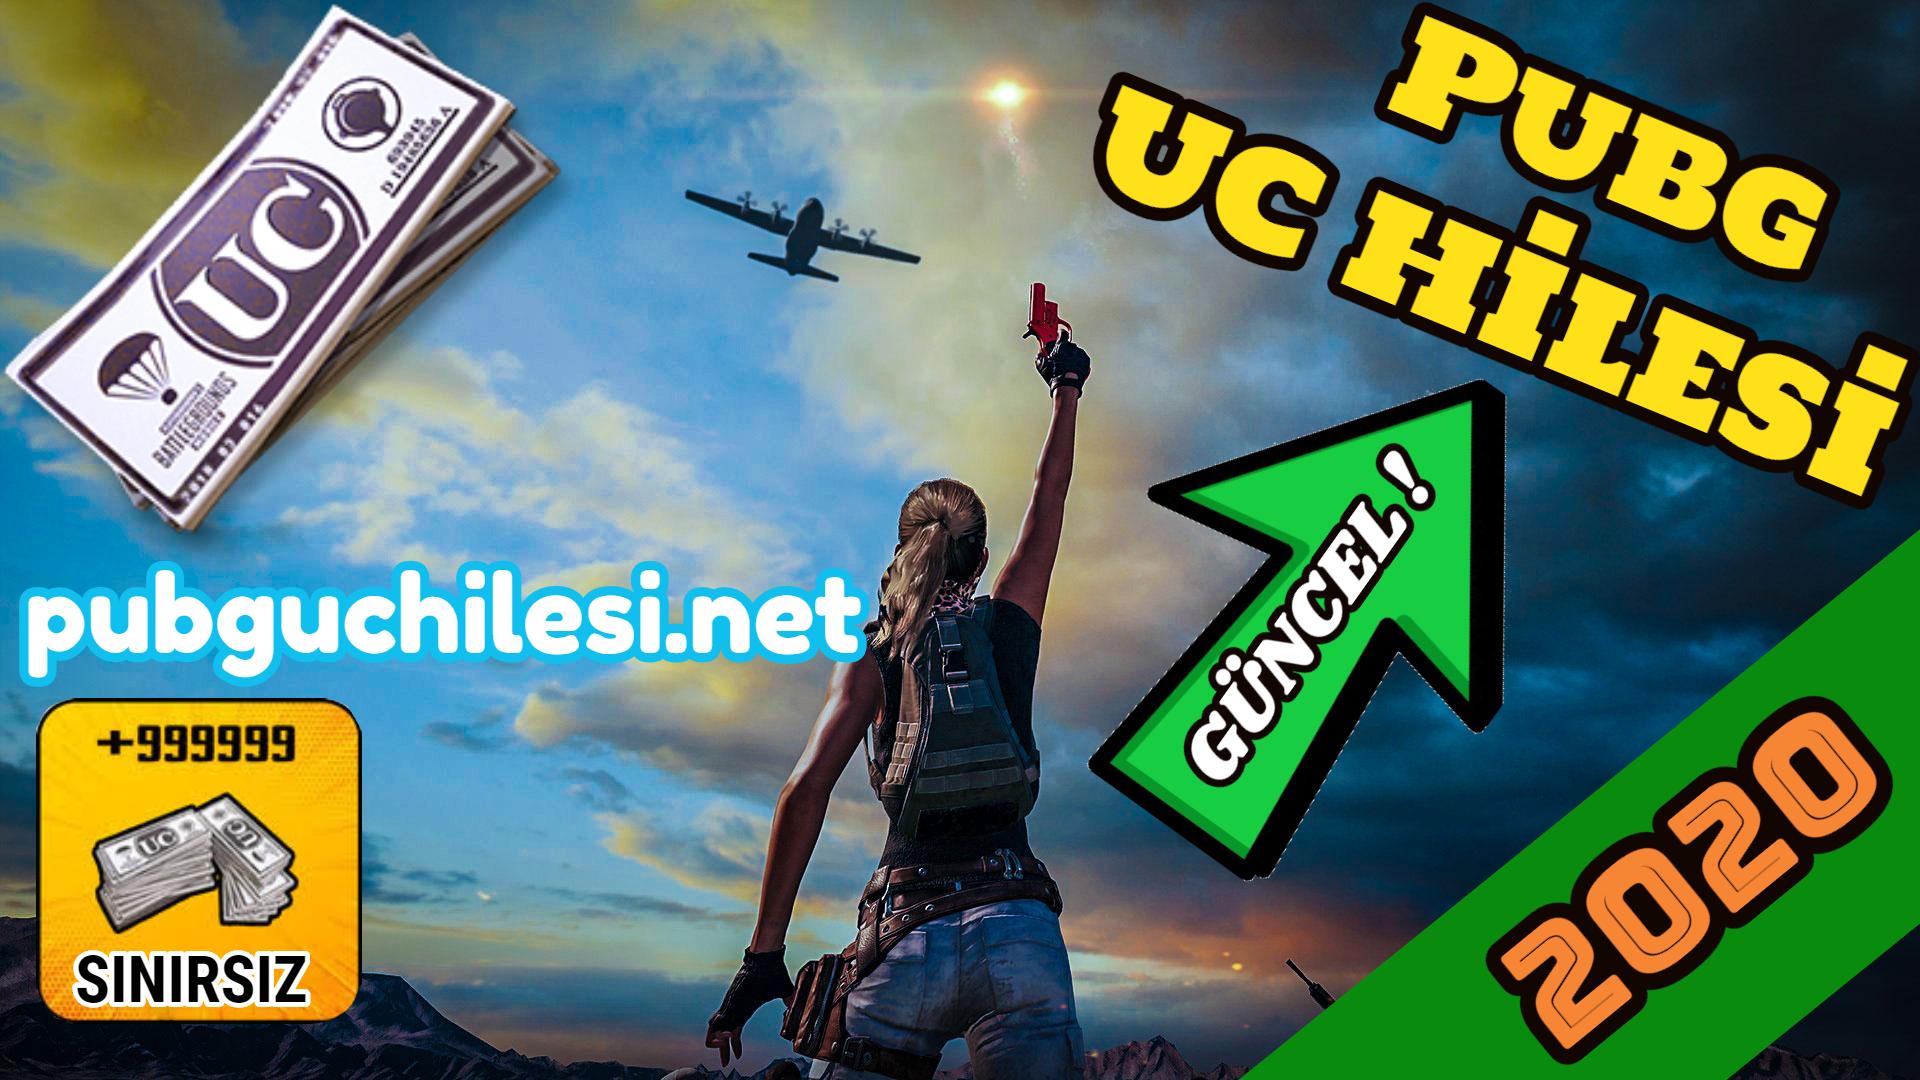 Pubg Uc Hilesi 2020 Hile Android Hileleri Xbox One